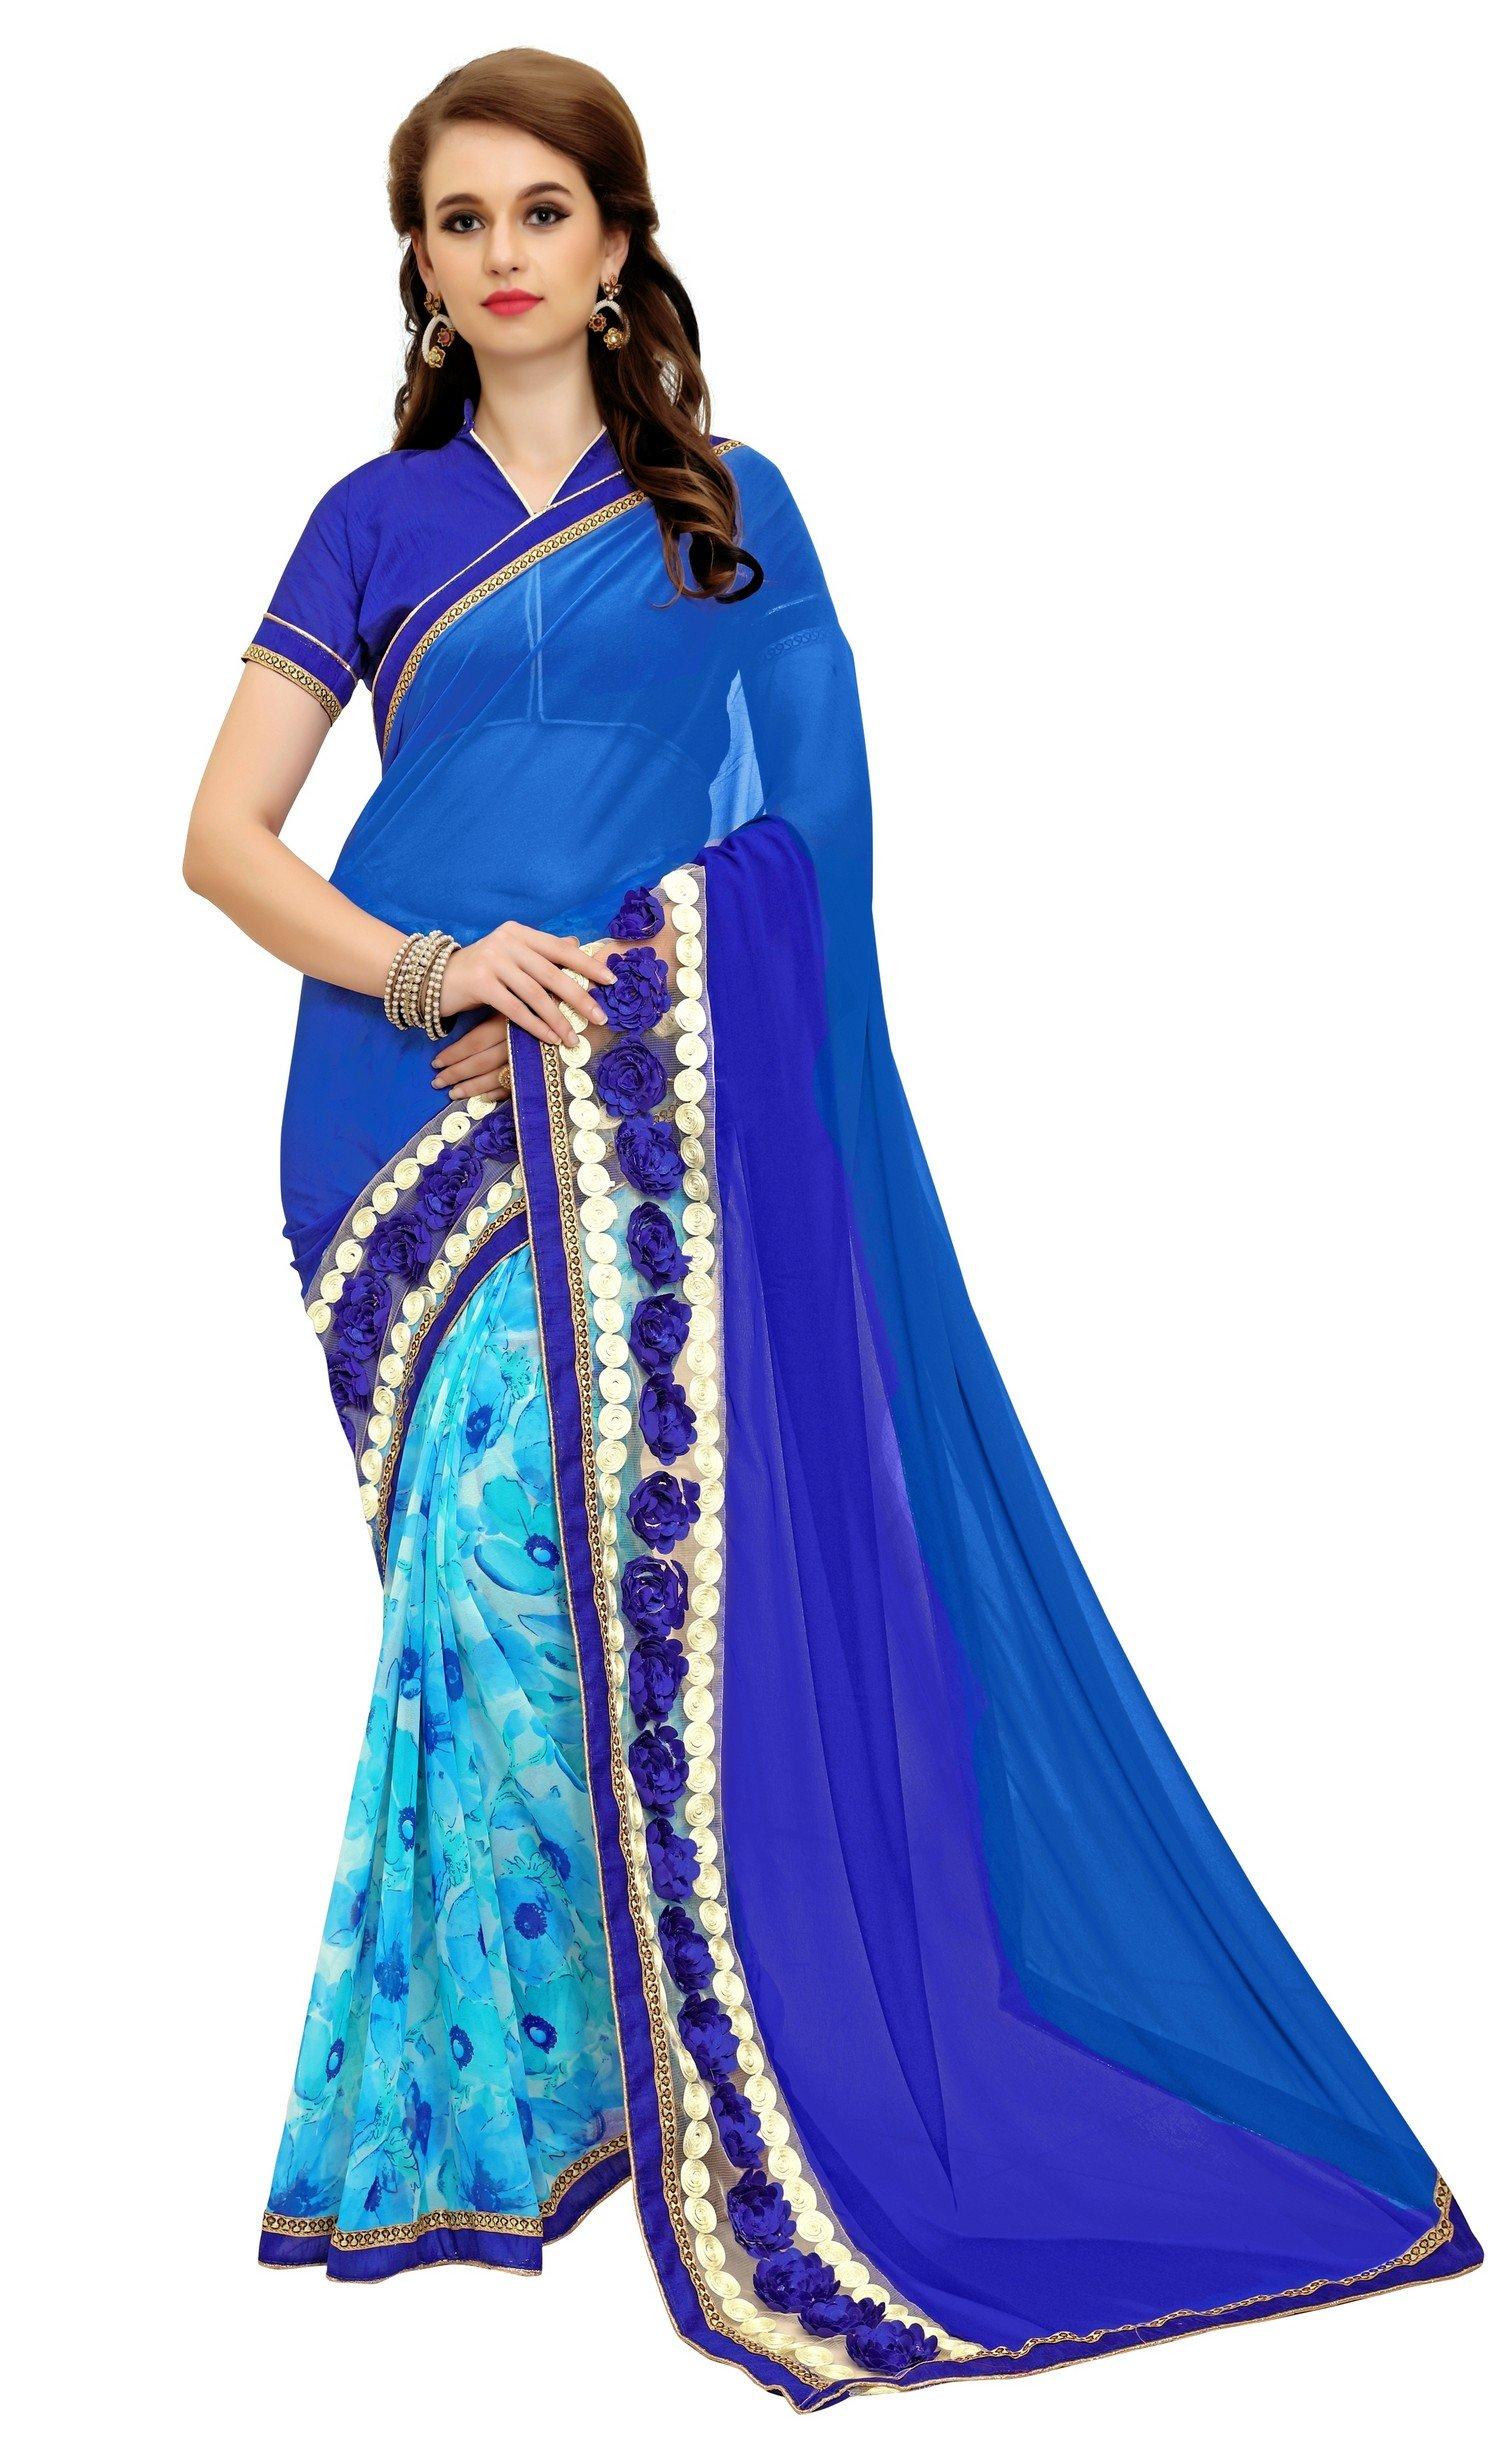 Women's Patch Work faux Georgette Designer Saree for women , Sarees, Sari , Indian Wedding Gift (Blue 1)